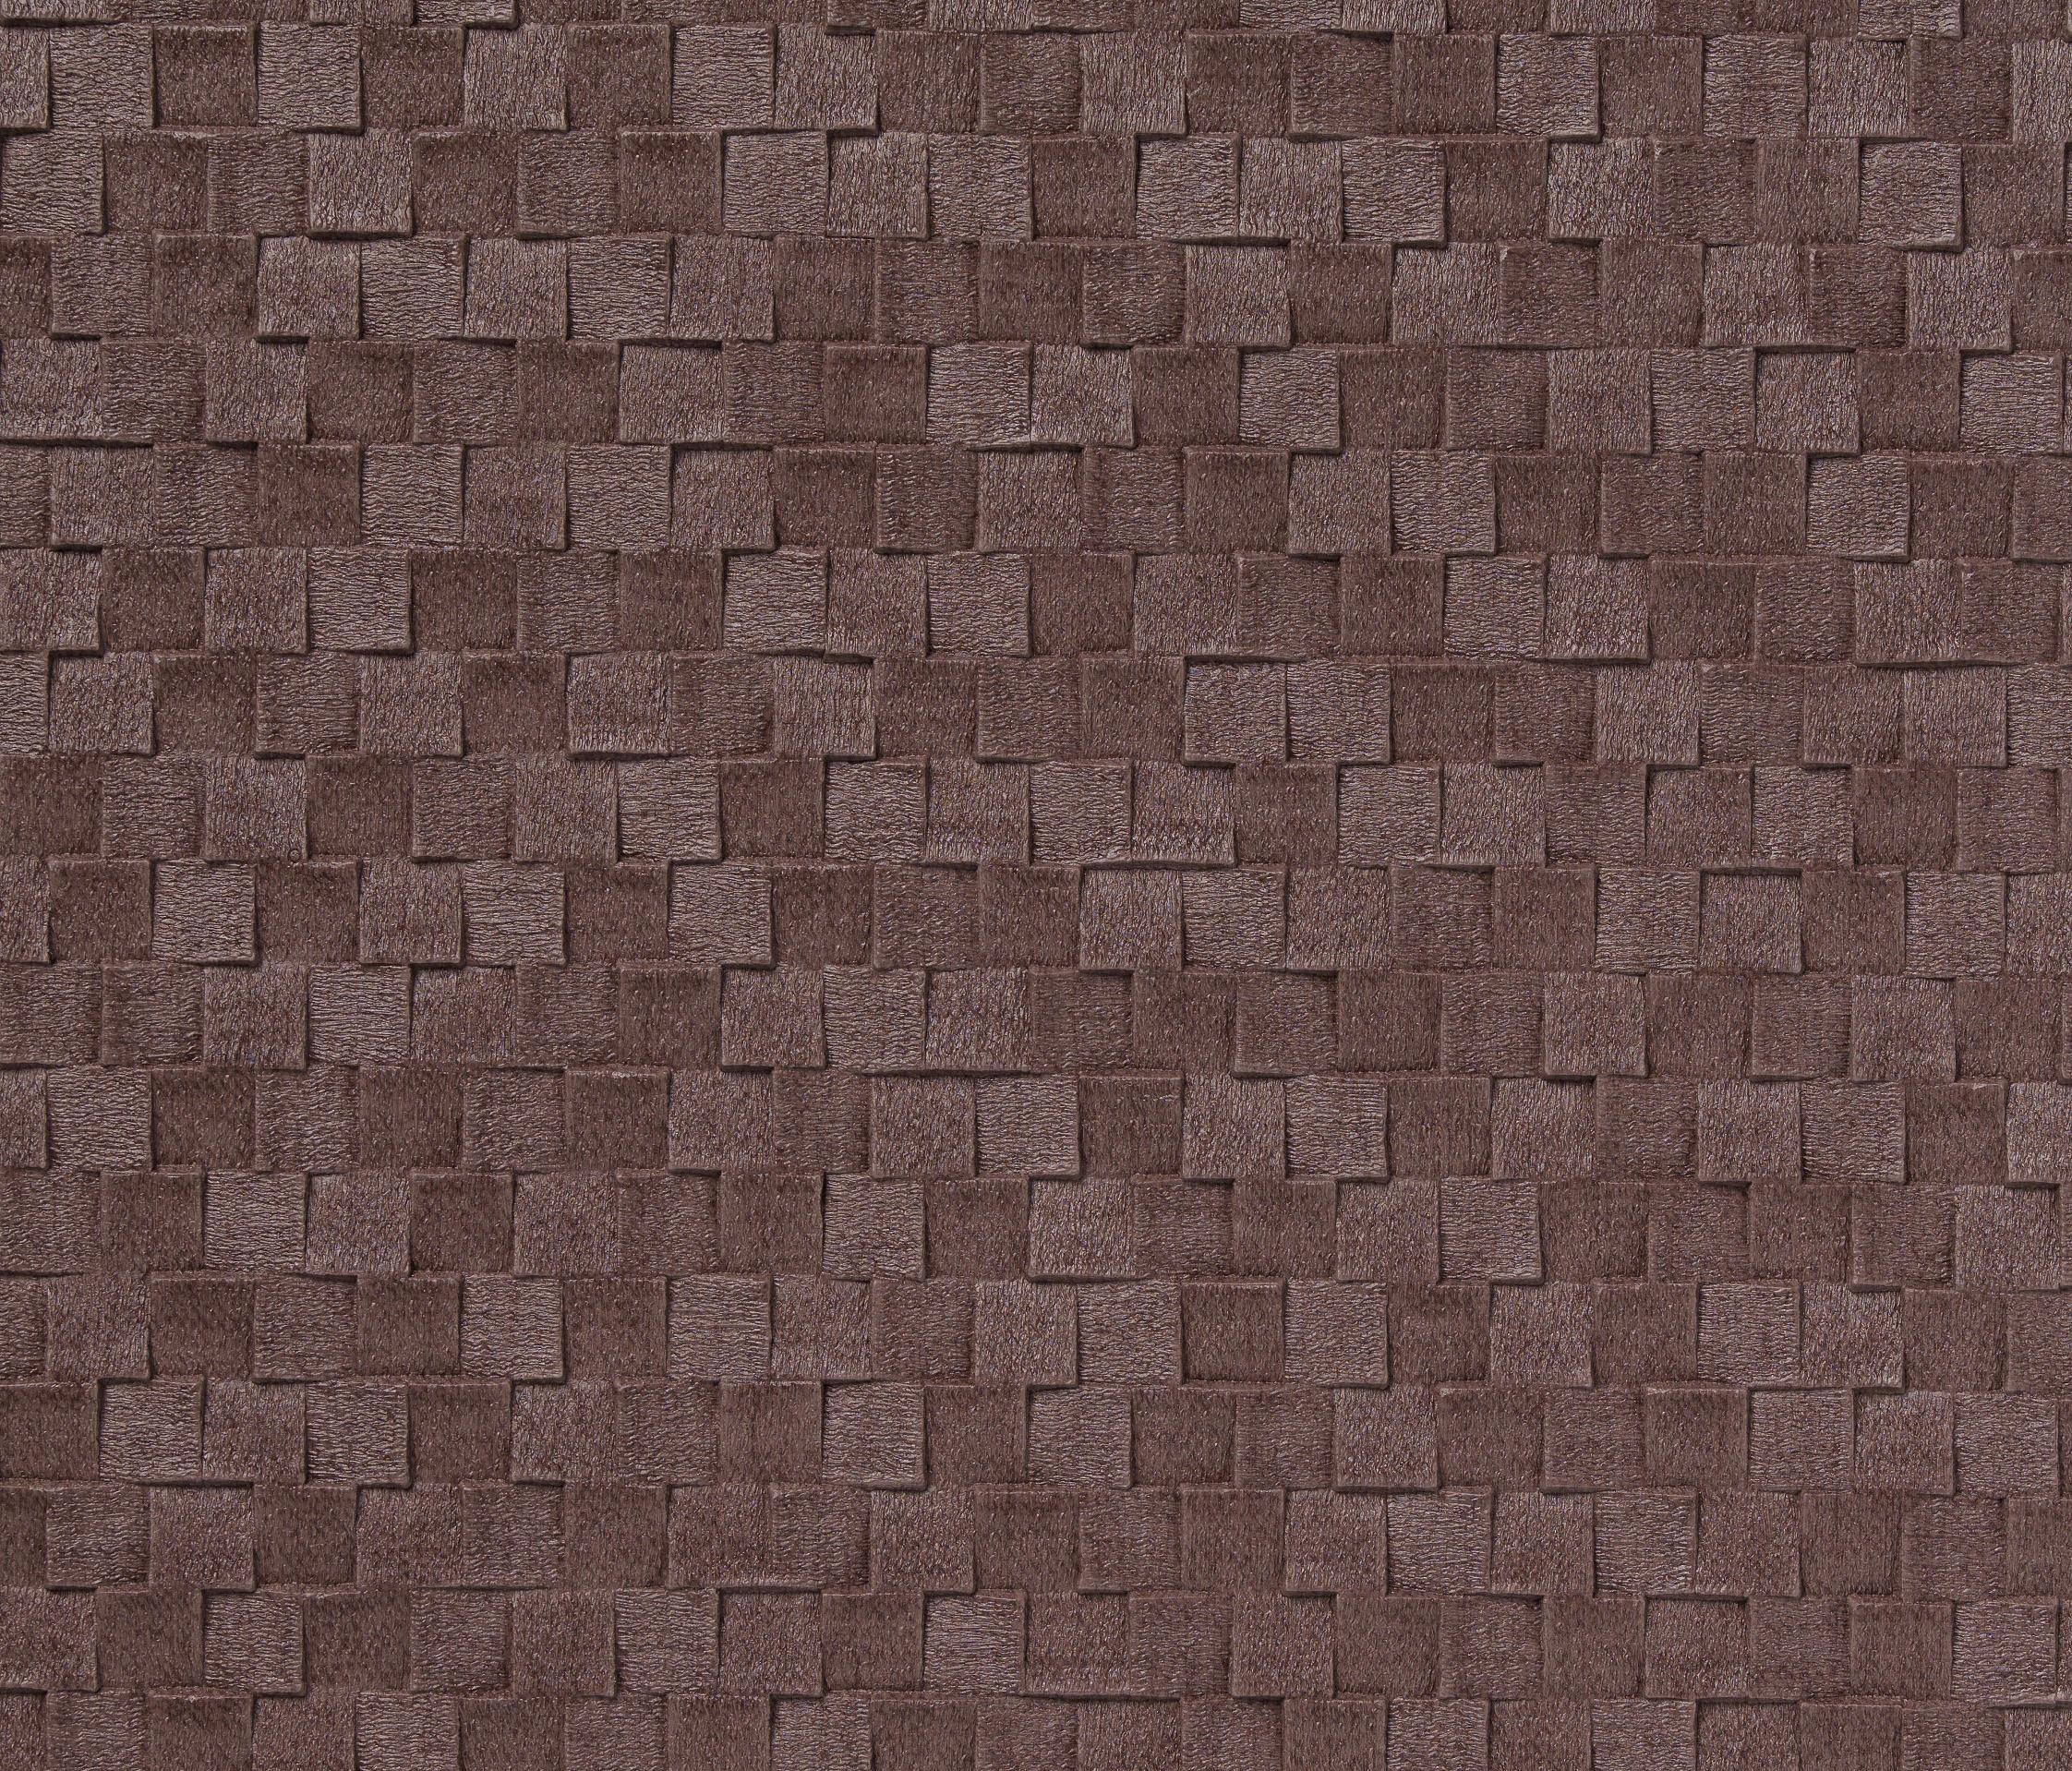 shannon tissus muraux de vescom architonic. Black Bedroom Furniture Sets. Home Design Ideas